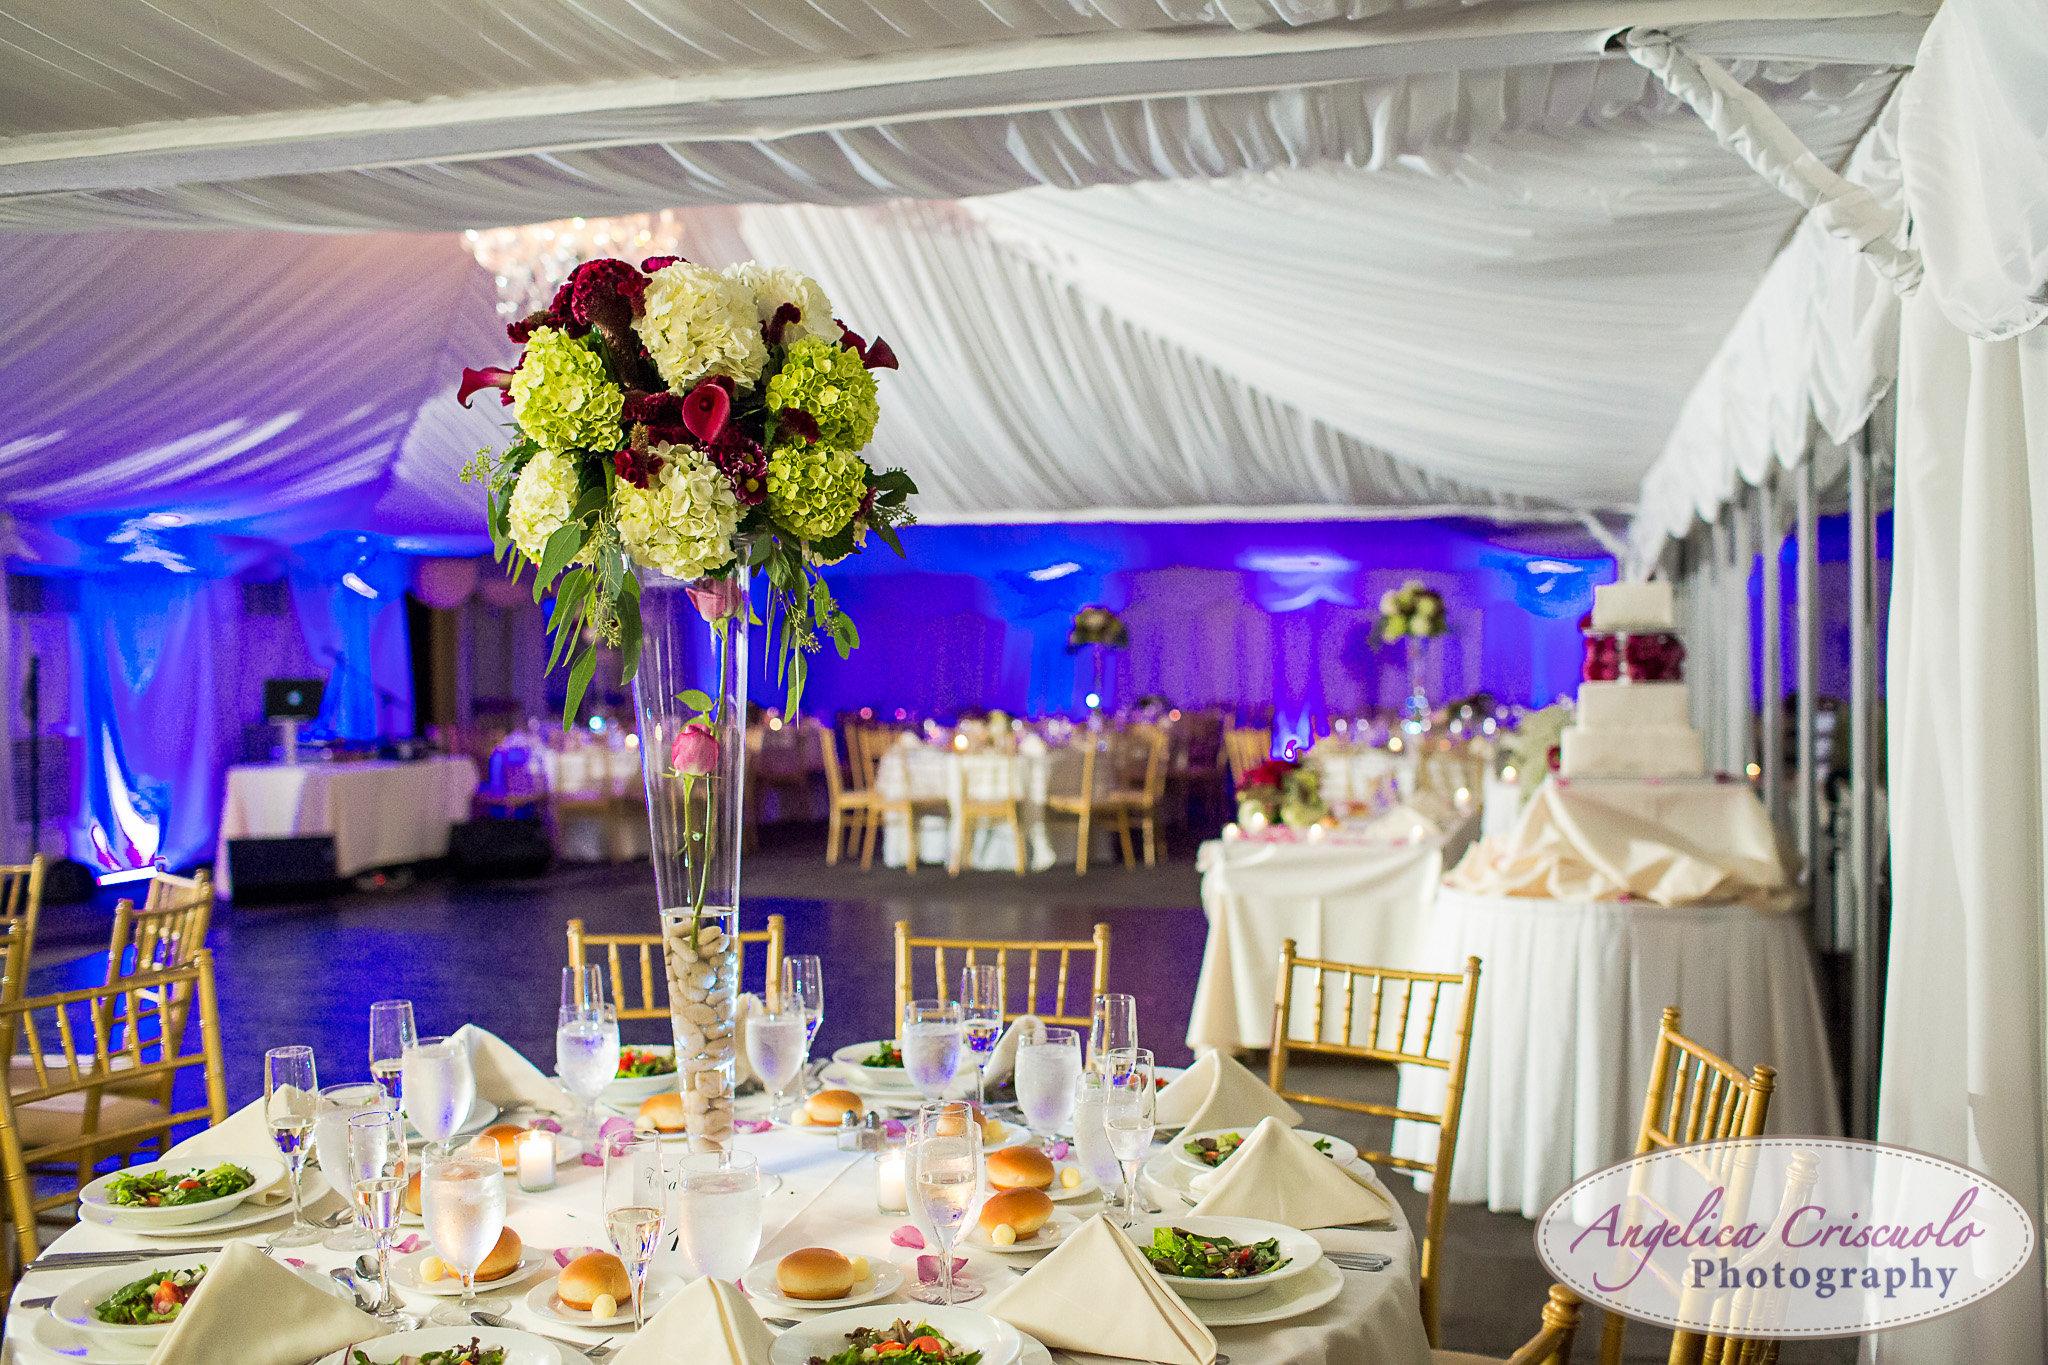 Simira NY Floral Design bridesmaid bouquet NY Wedding Photographer center pieces